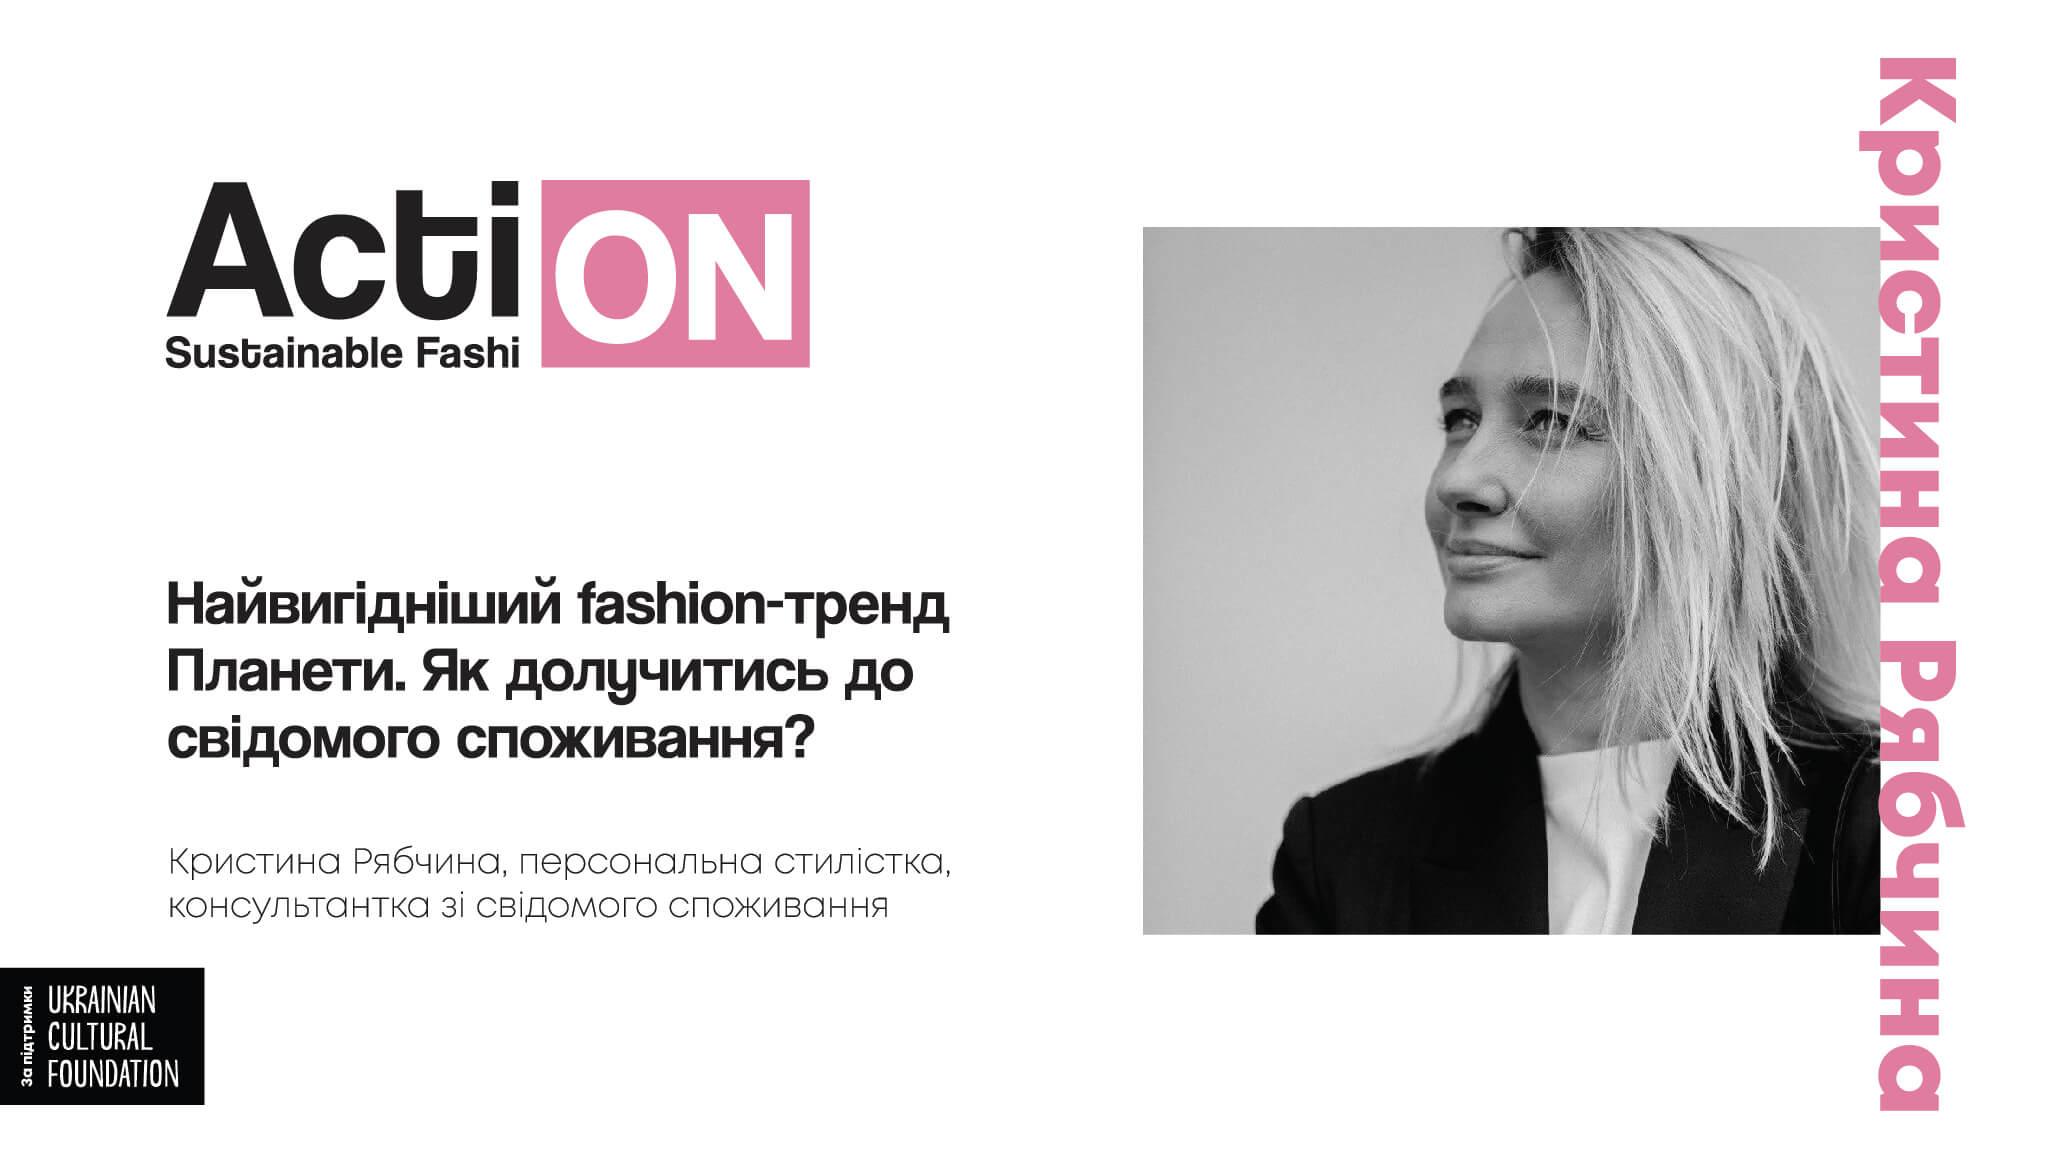 Action: Sustainable Fashion: Освітня Програма-Фото 2